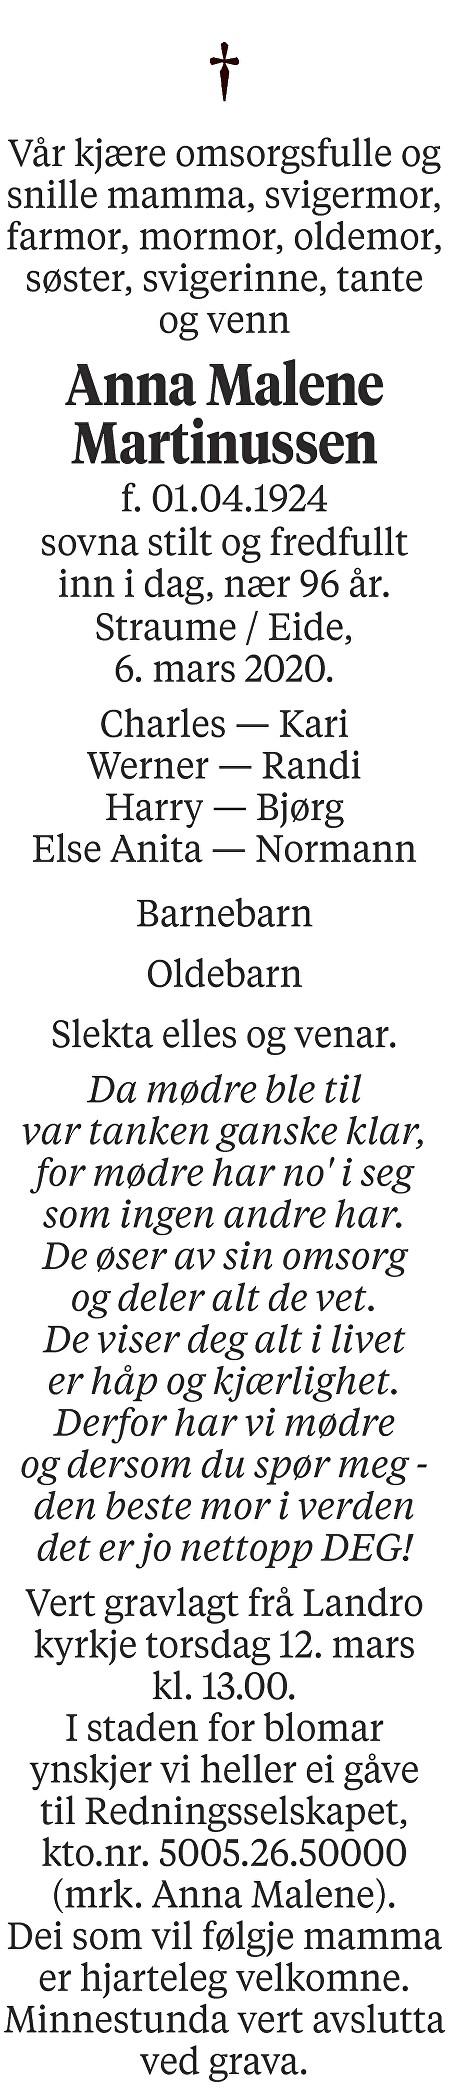 Anna Malene Martinussen Dødsannonse